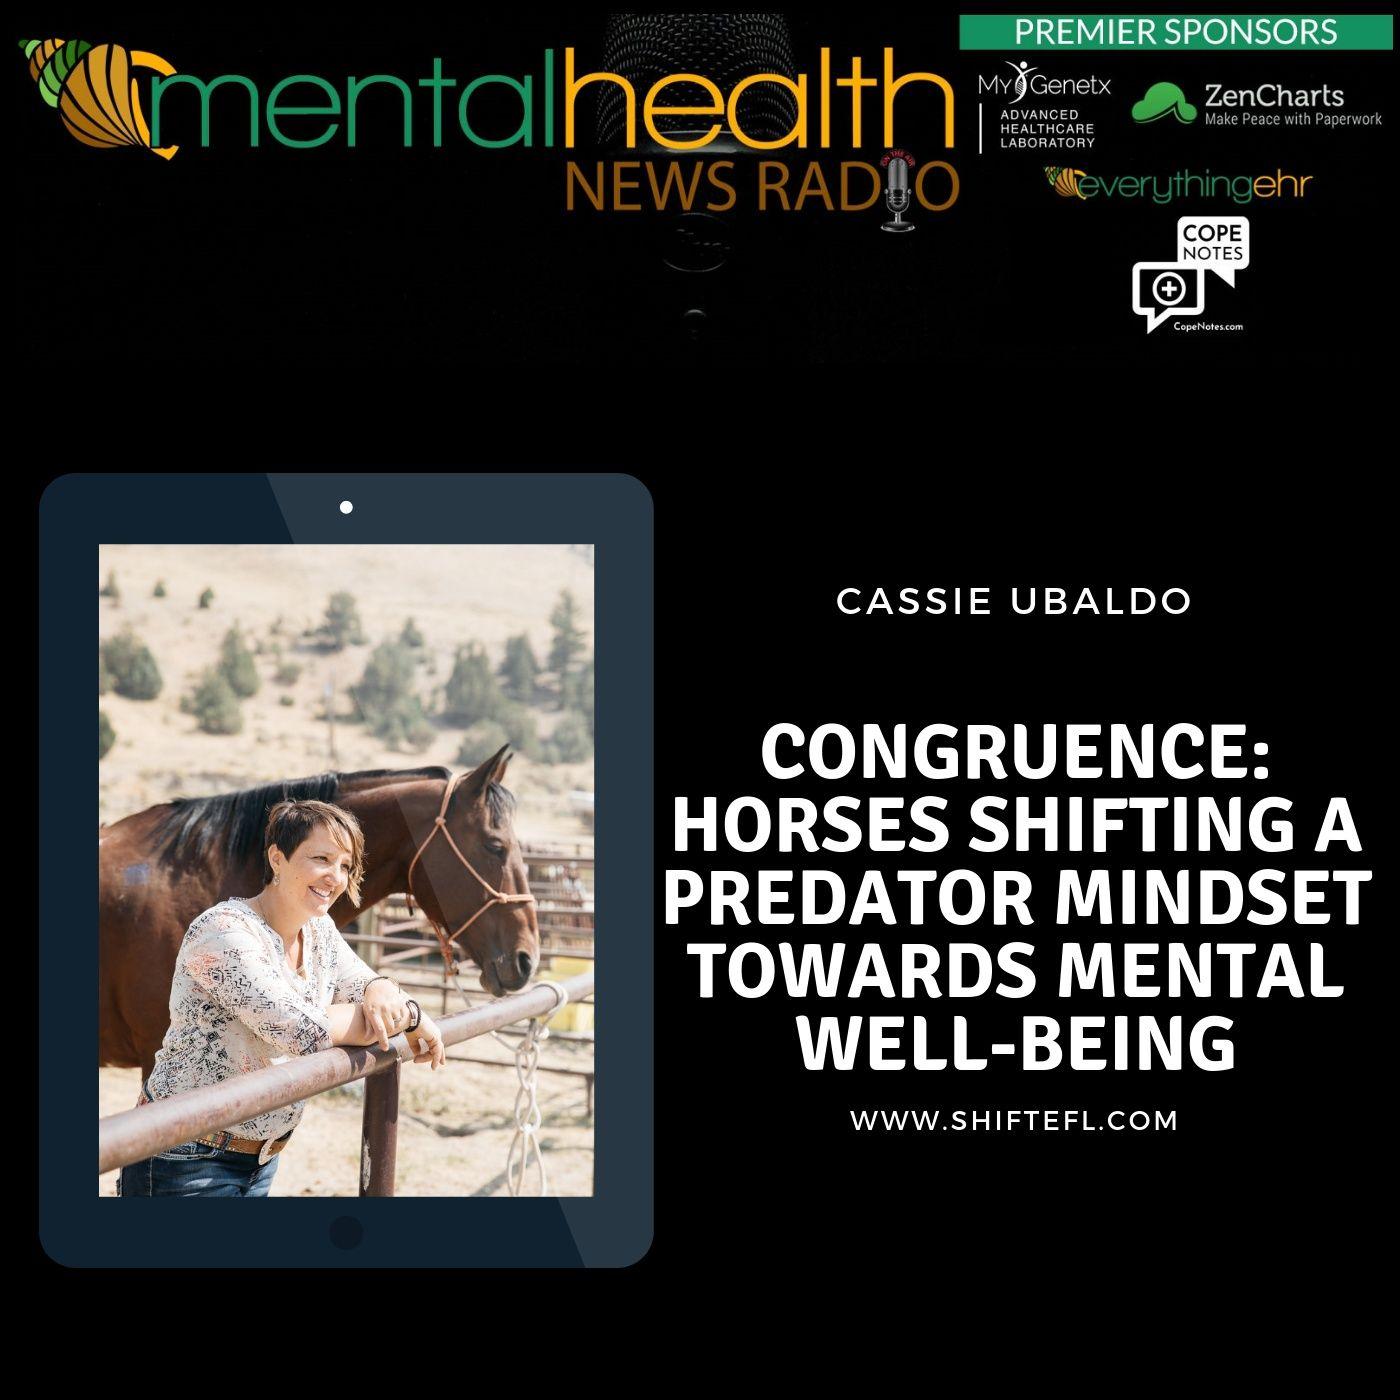 Mental Health News Radio - Congruence: Horses Shifting A Predator Mindset Towards Mental Well-Being